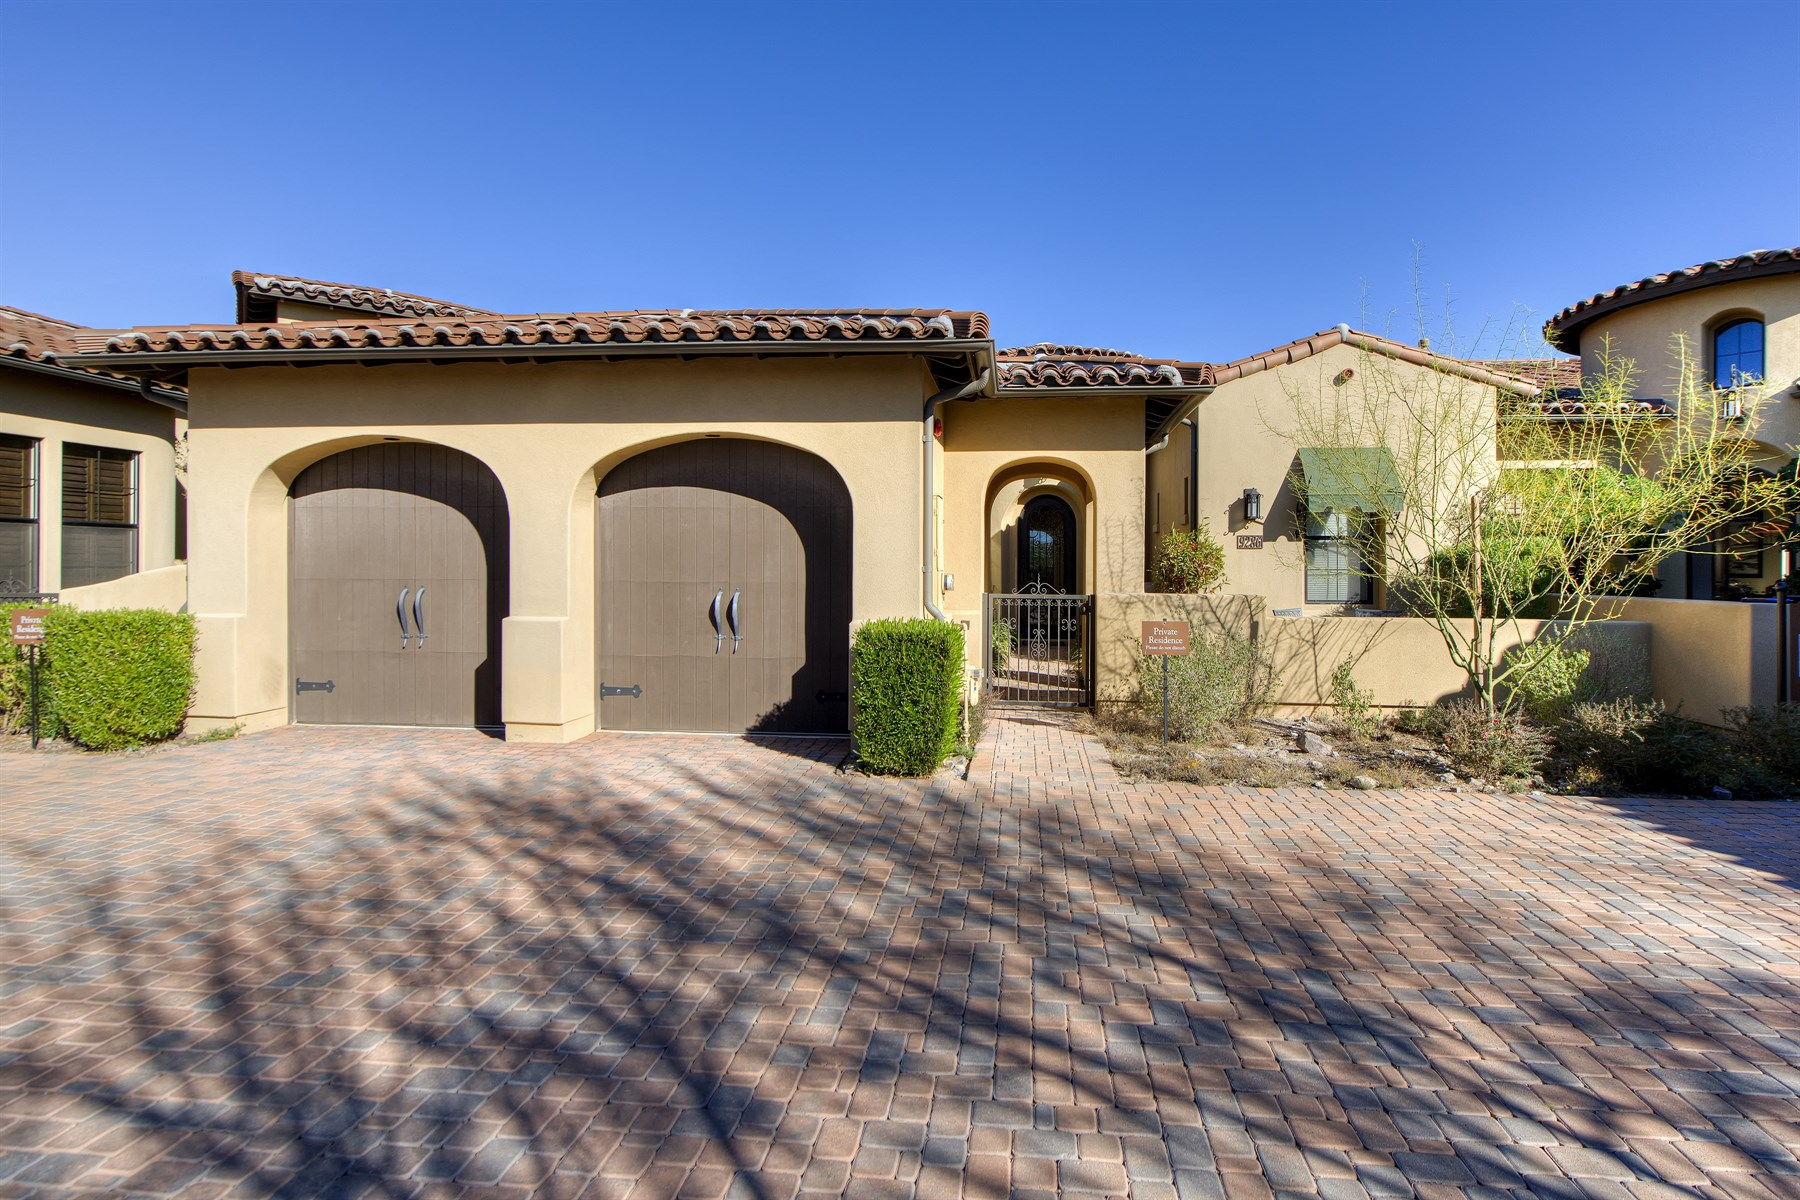 Moradia em banda para Venda às Gorgeous Home In The Heart Of North Scottsdale's Highly Desired Gated DC Ranch 9286 E Hoverland Rd Scottsdale, Arizona 85255 Estados Unidos